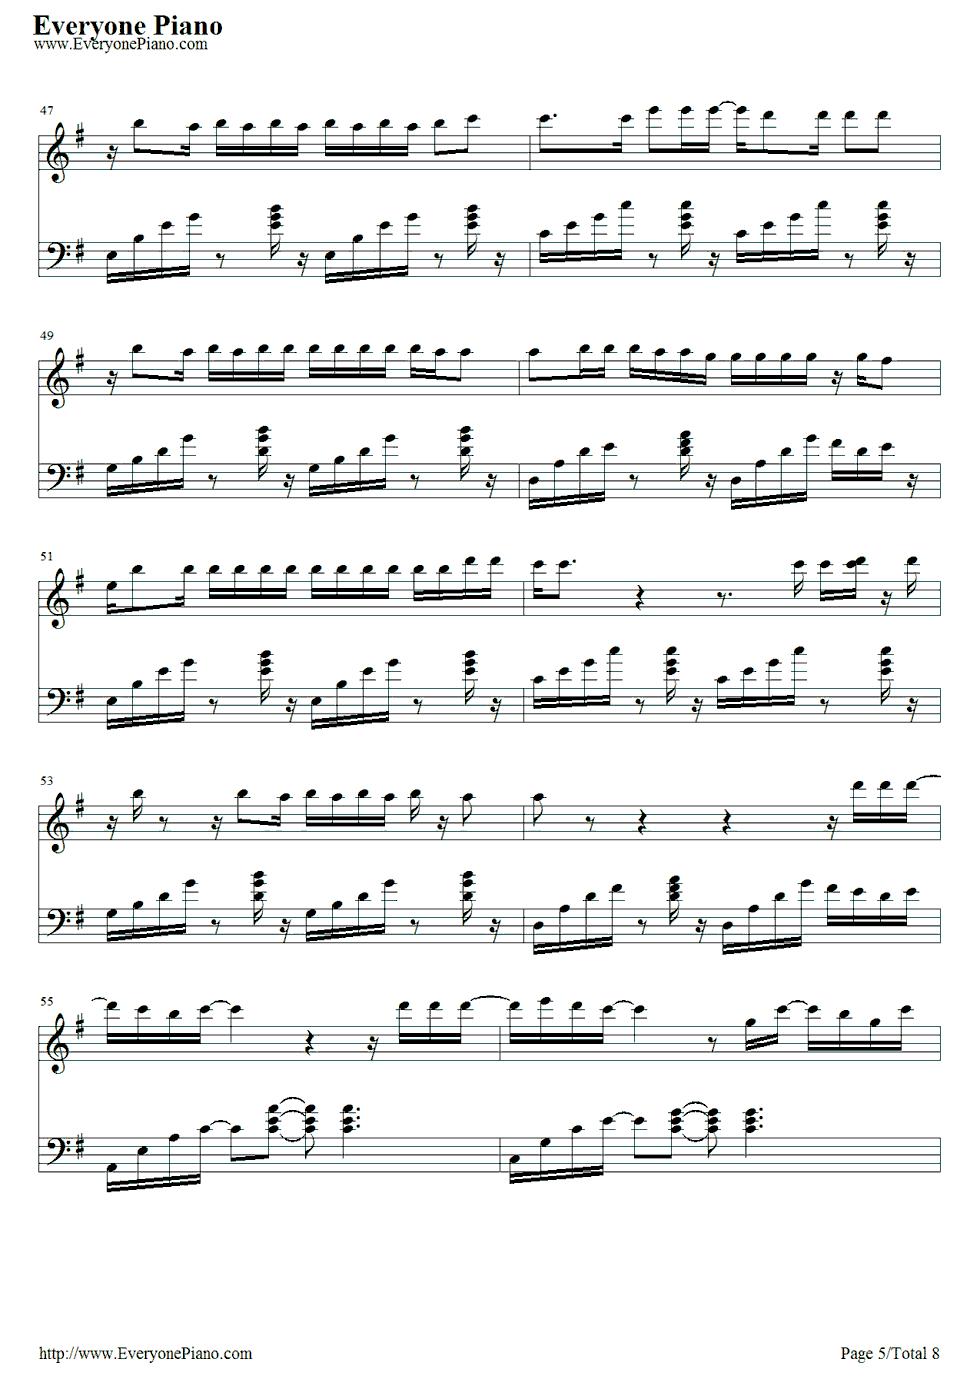 Harmonium Basics  Harmonium Notations  Harmonium Lessons